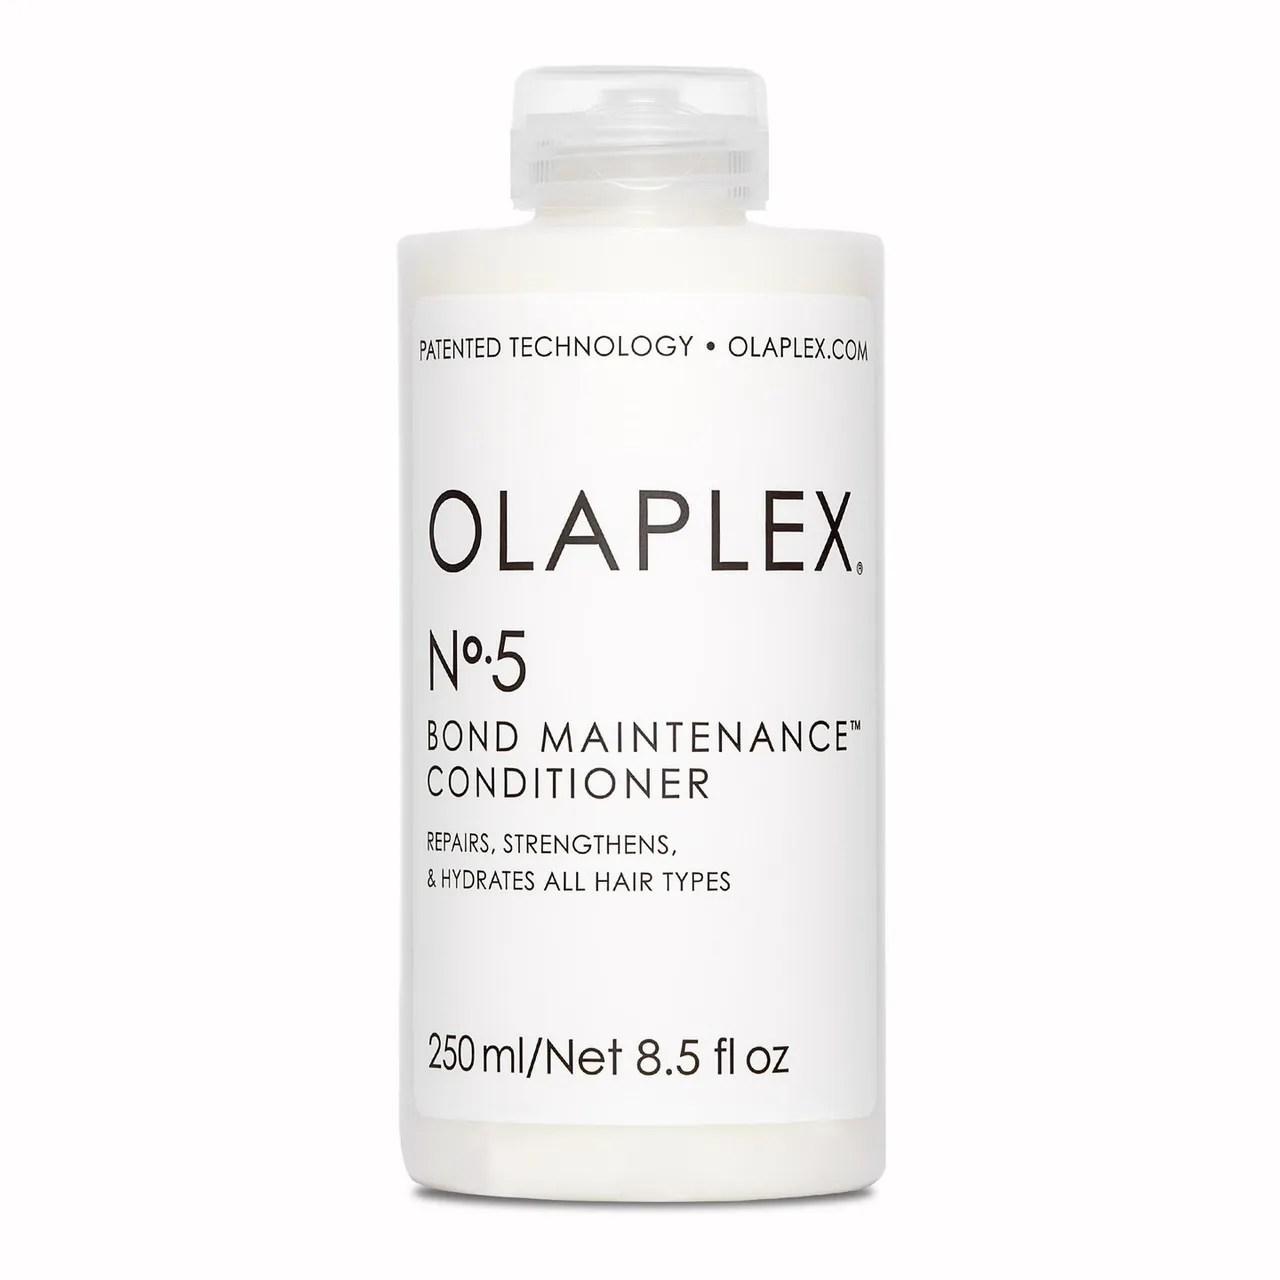 Olaplex No.5 Bond Maintenance Conditioner on white background